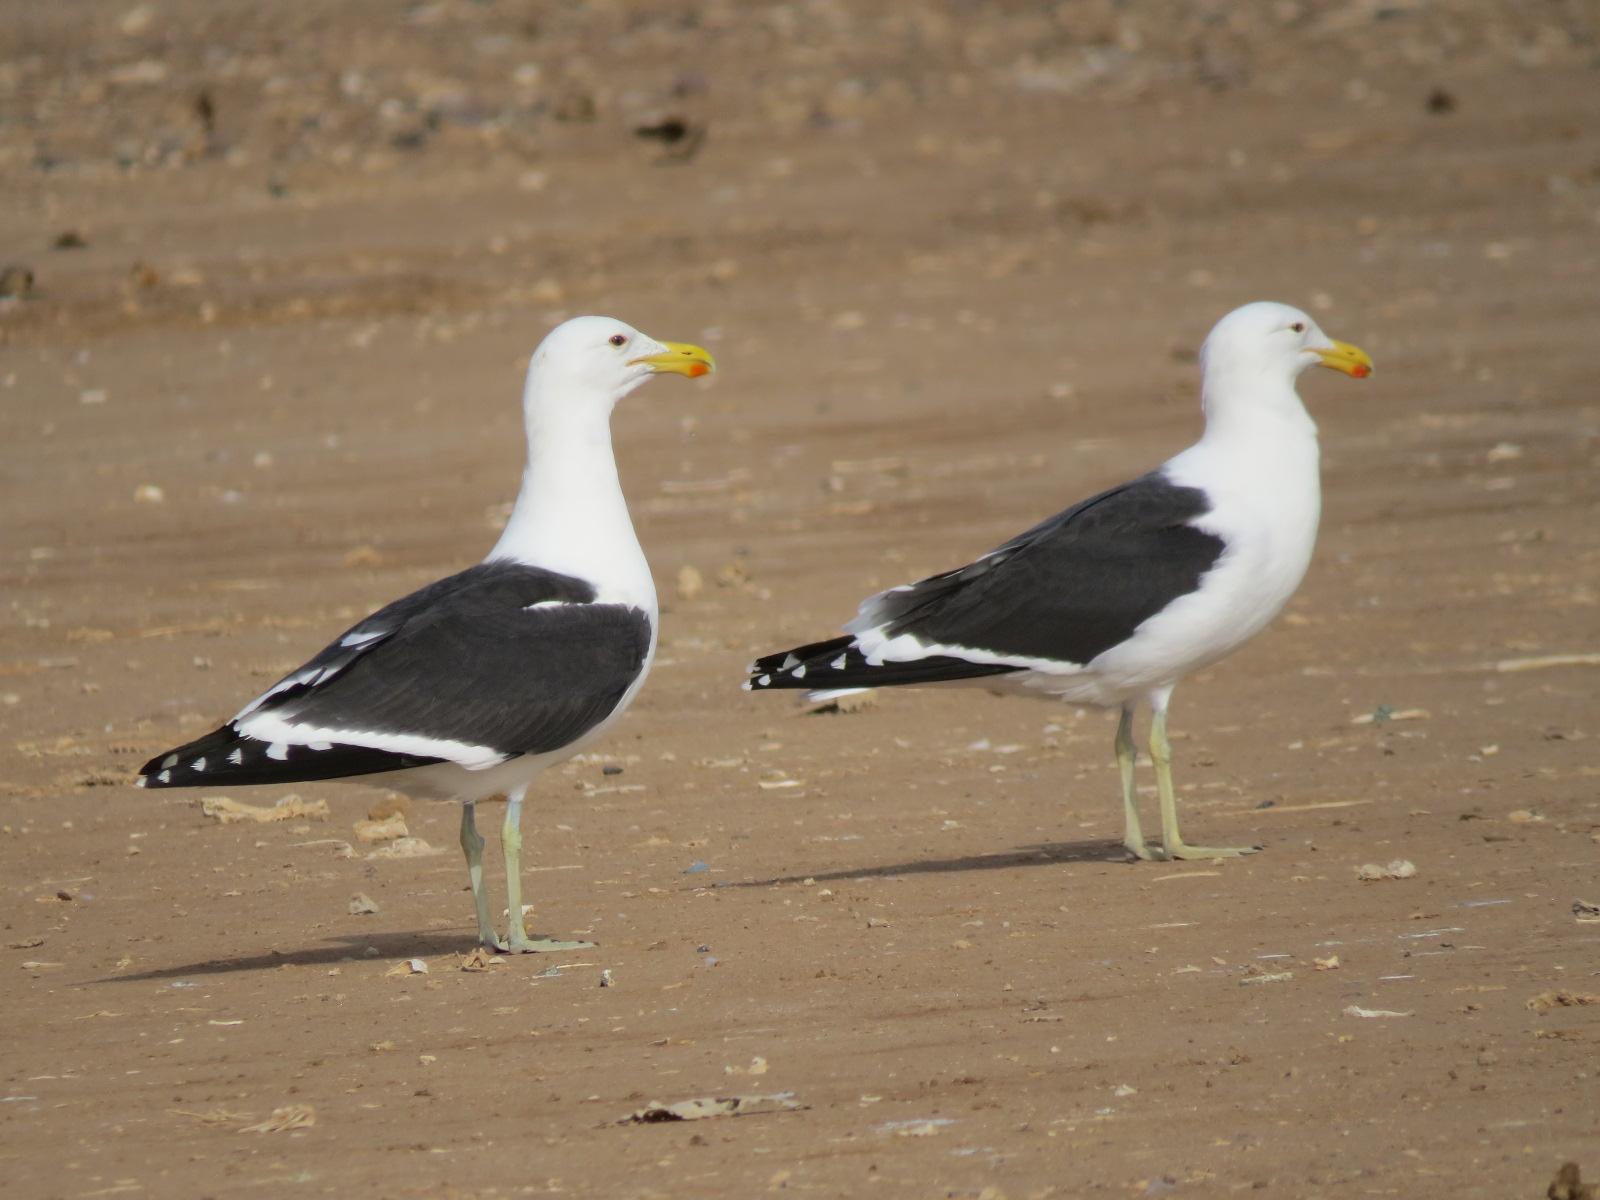 Kelp Gulls (Larus dominicanus), Akhfenir, southern Morocco, 25 Feb. 2017 (Robert Swann)